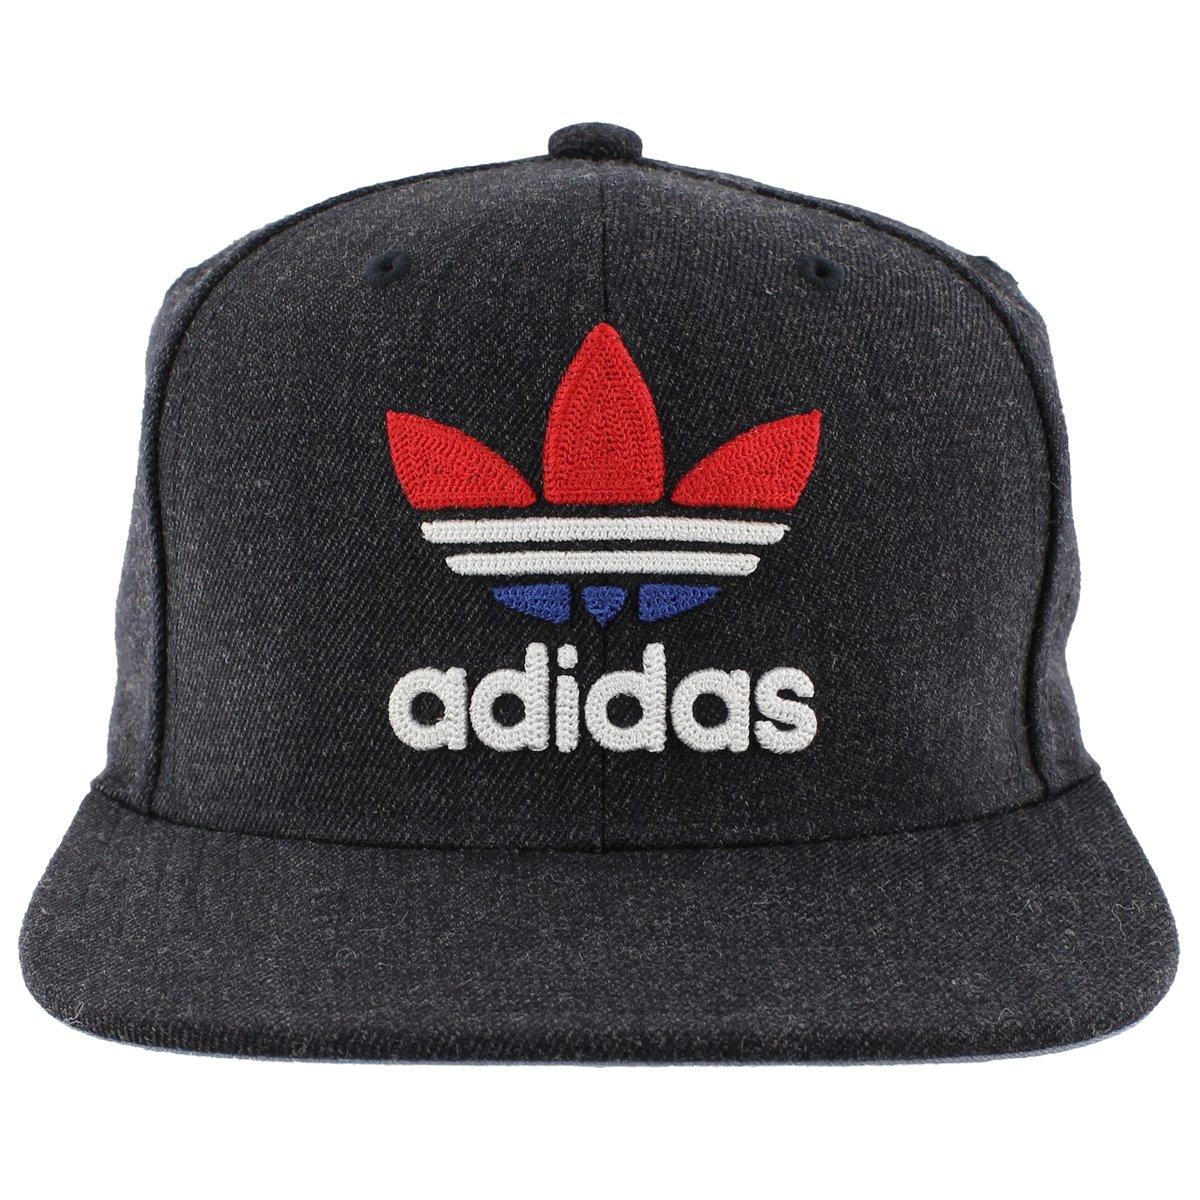 adidas Men's Originals Snapback Flatbrim Cap, Heather Navy, One Size by adidas Originals (Image #2)